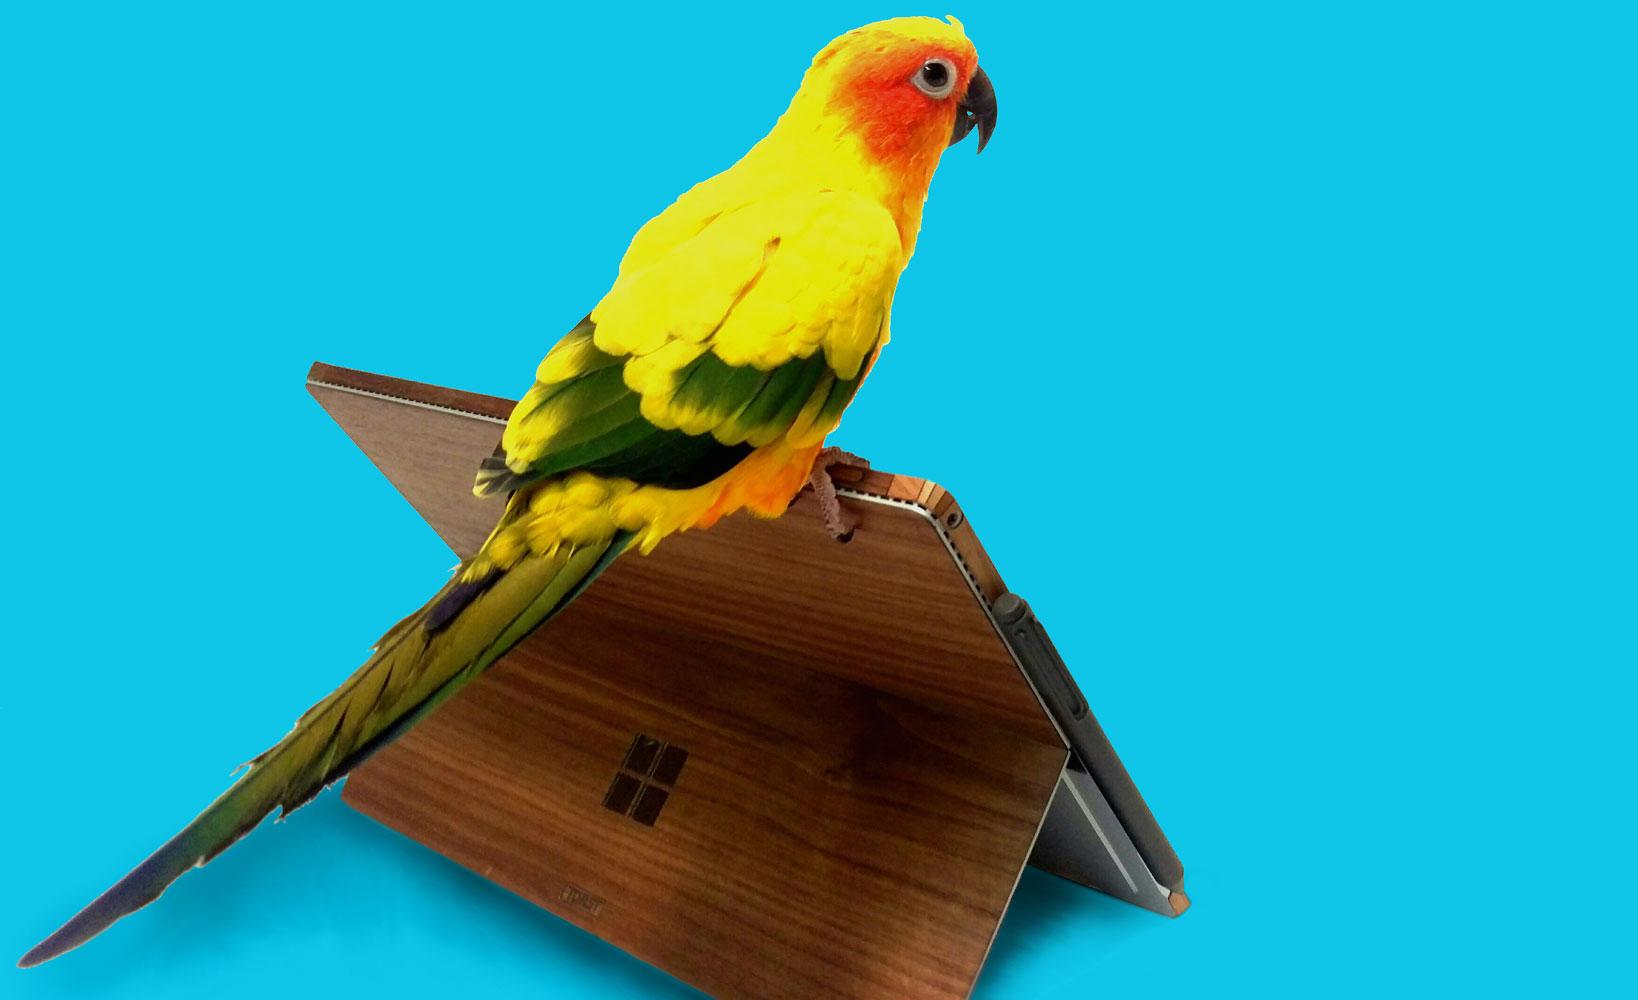 surface-with-parrot-blue-bg-banner-2.jpg